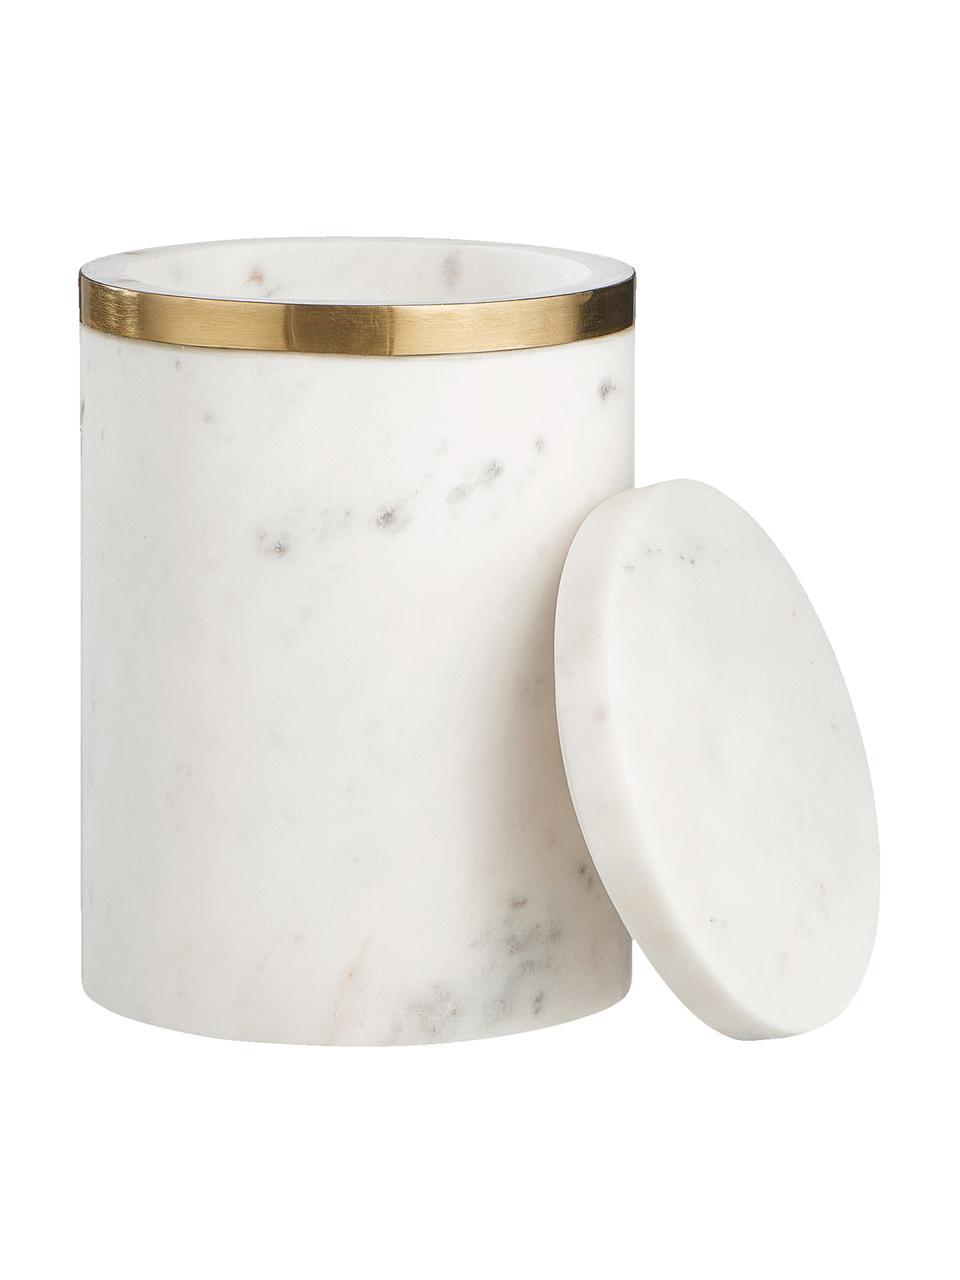 Marmor-Aufbewahrungsdose Maniu, Marmor, Weiß, Ø 12 x H 16 cm